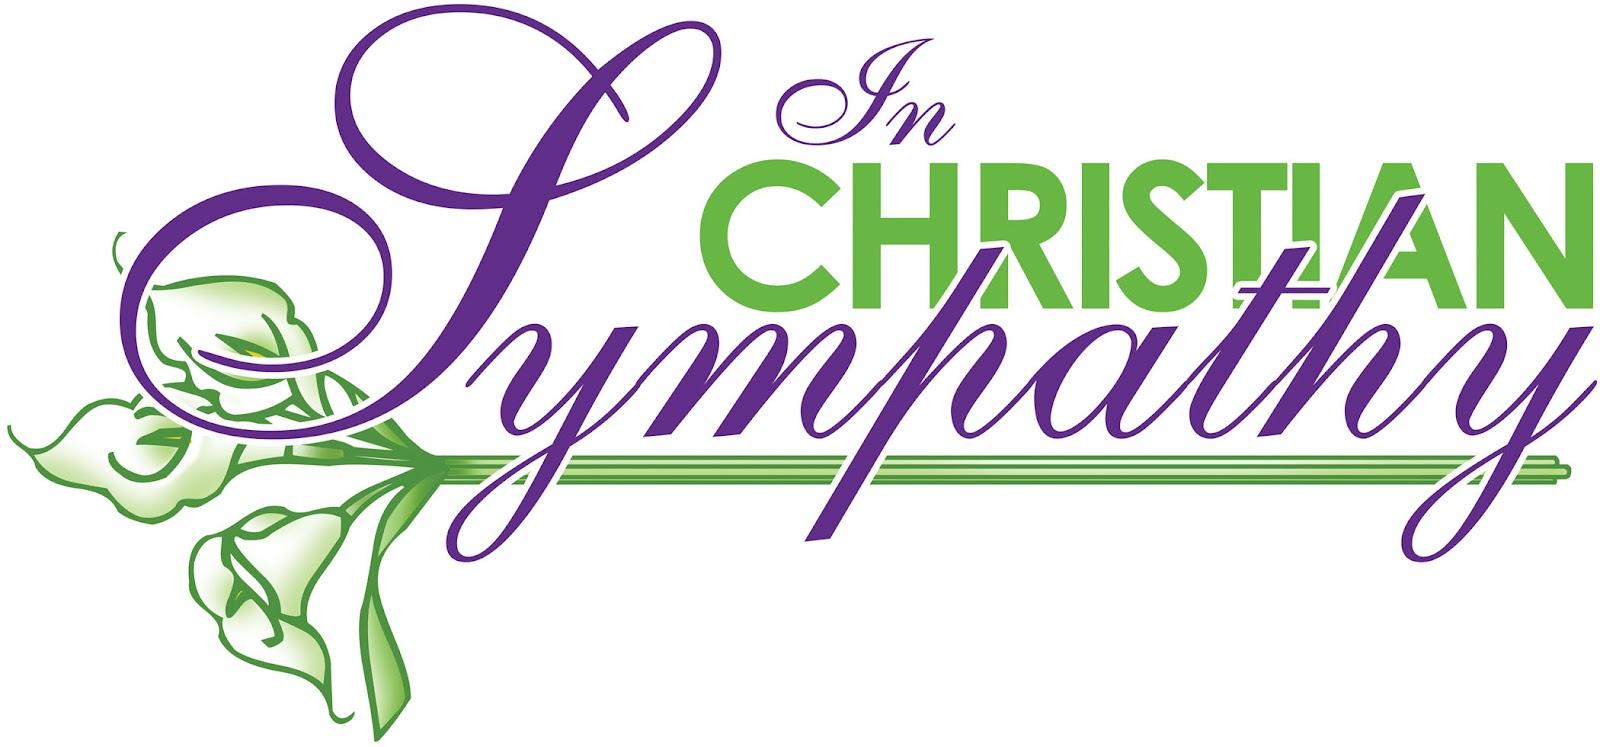 Free Sympathy Cliparts, Download Free Clip Art, Free Clip.